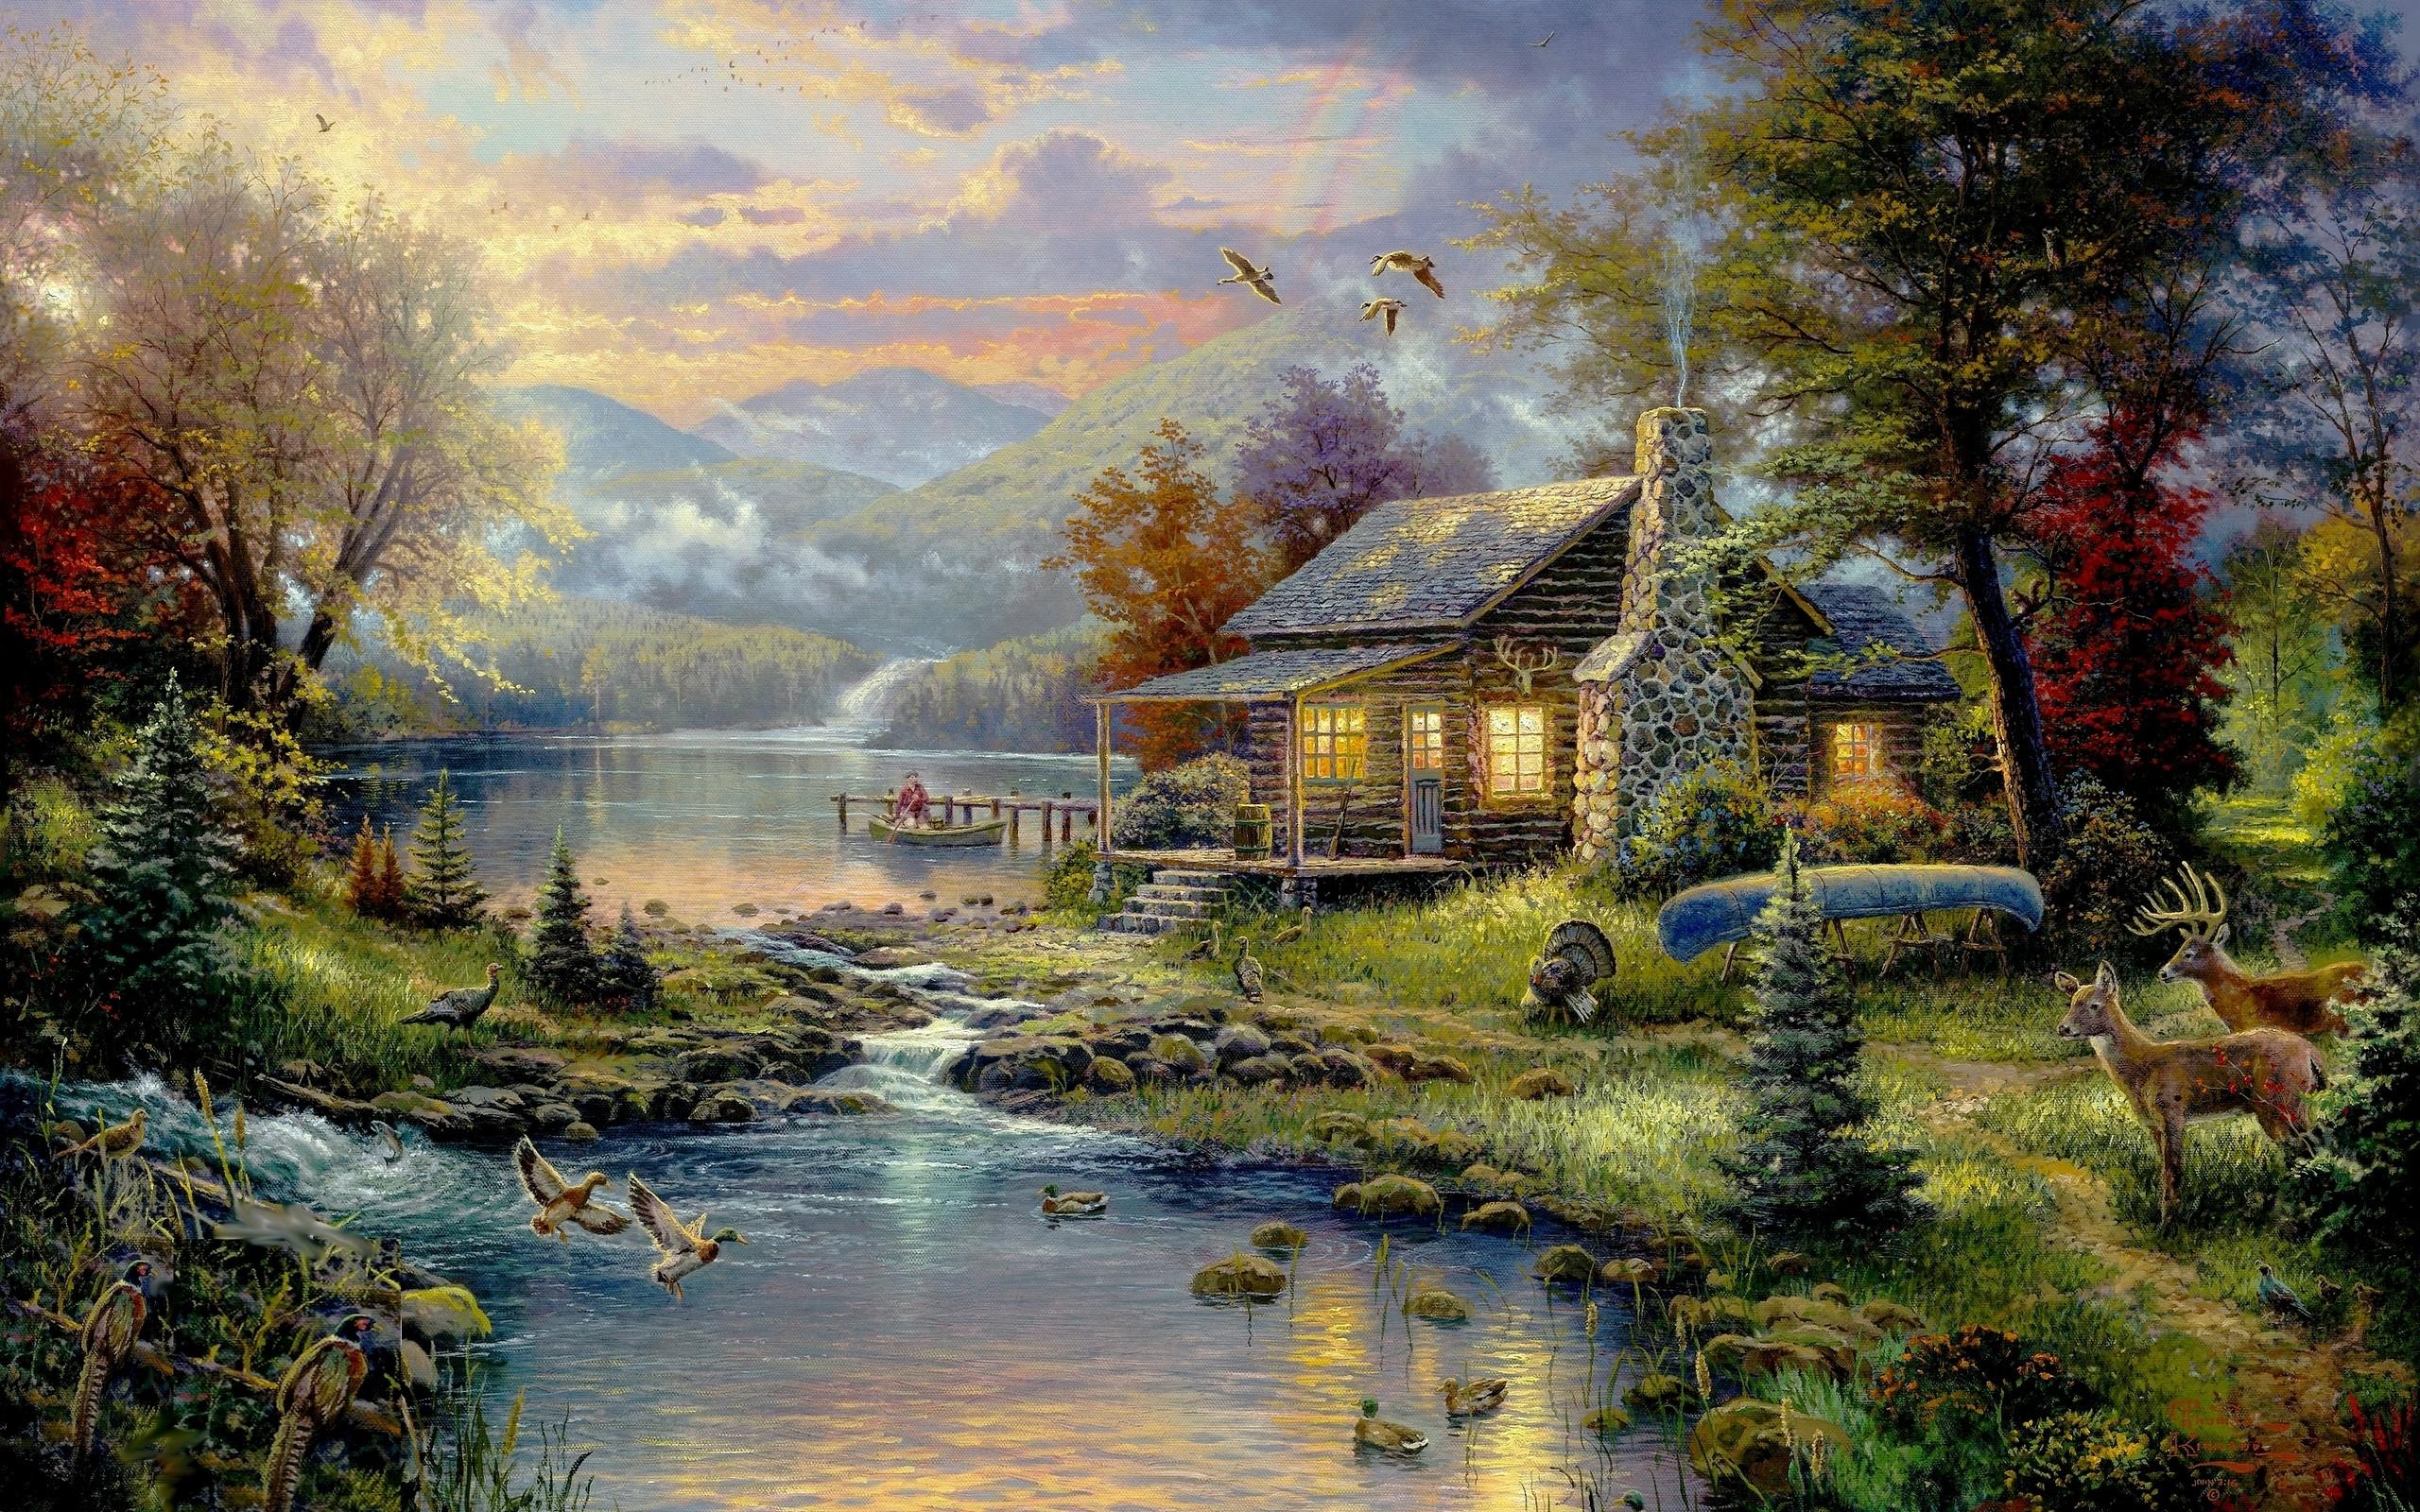 nature birds animals houses rainbows artwork wallpaper background 2560x1600